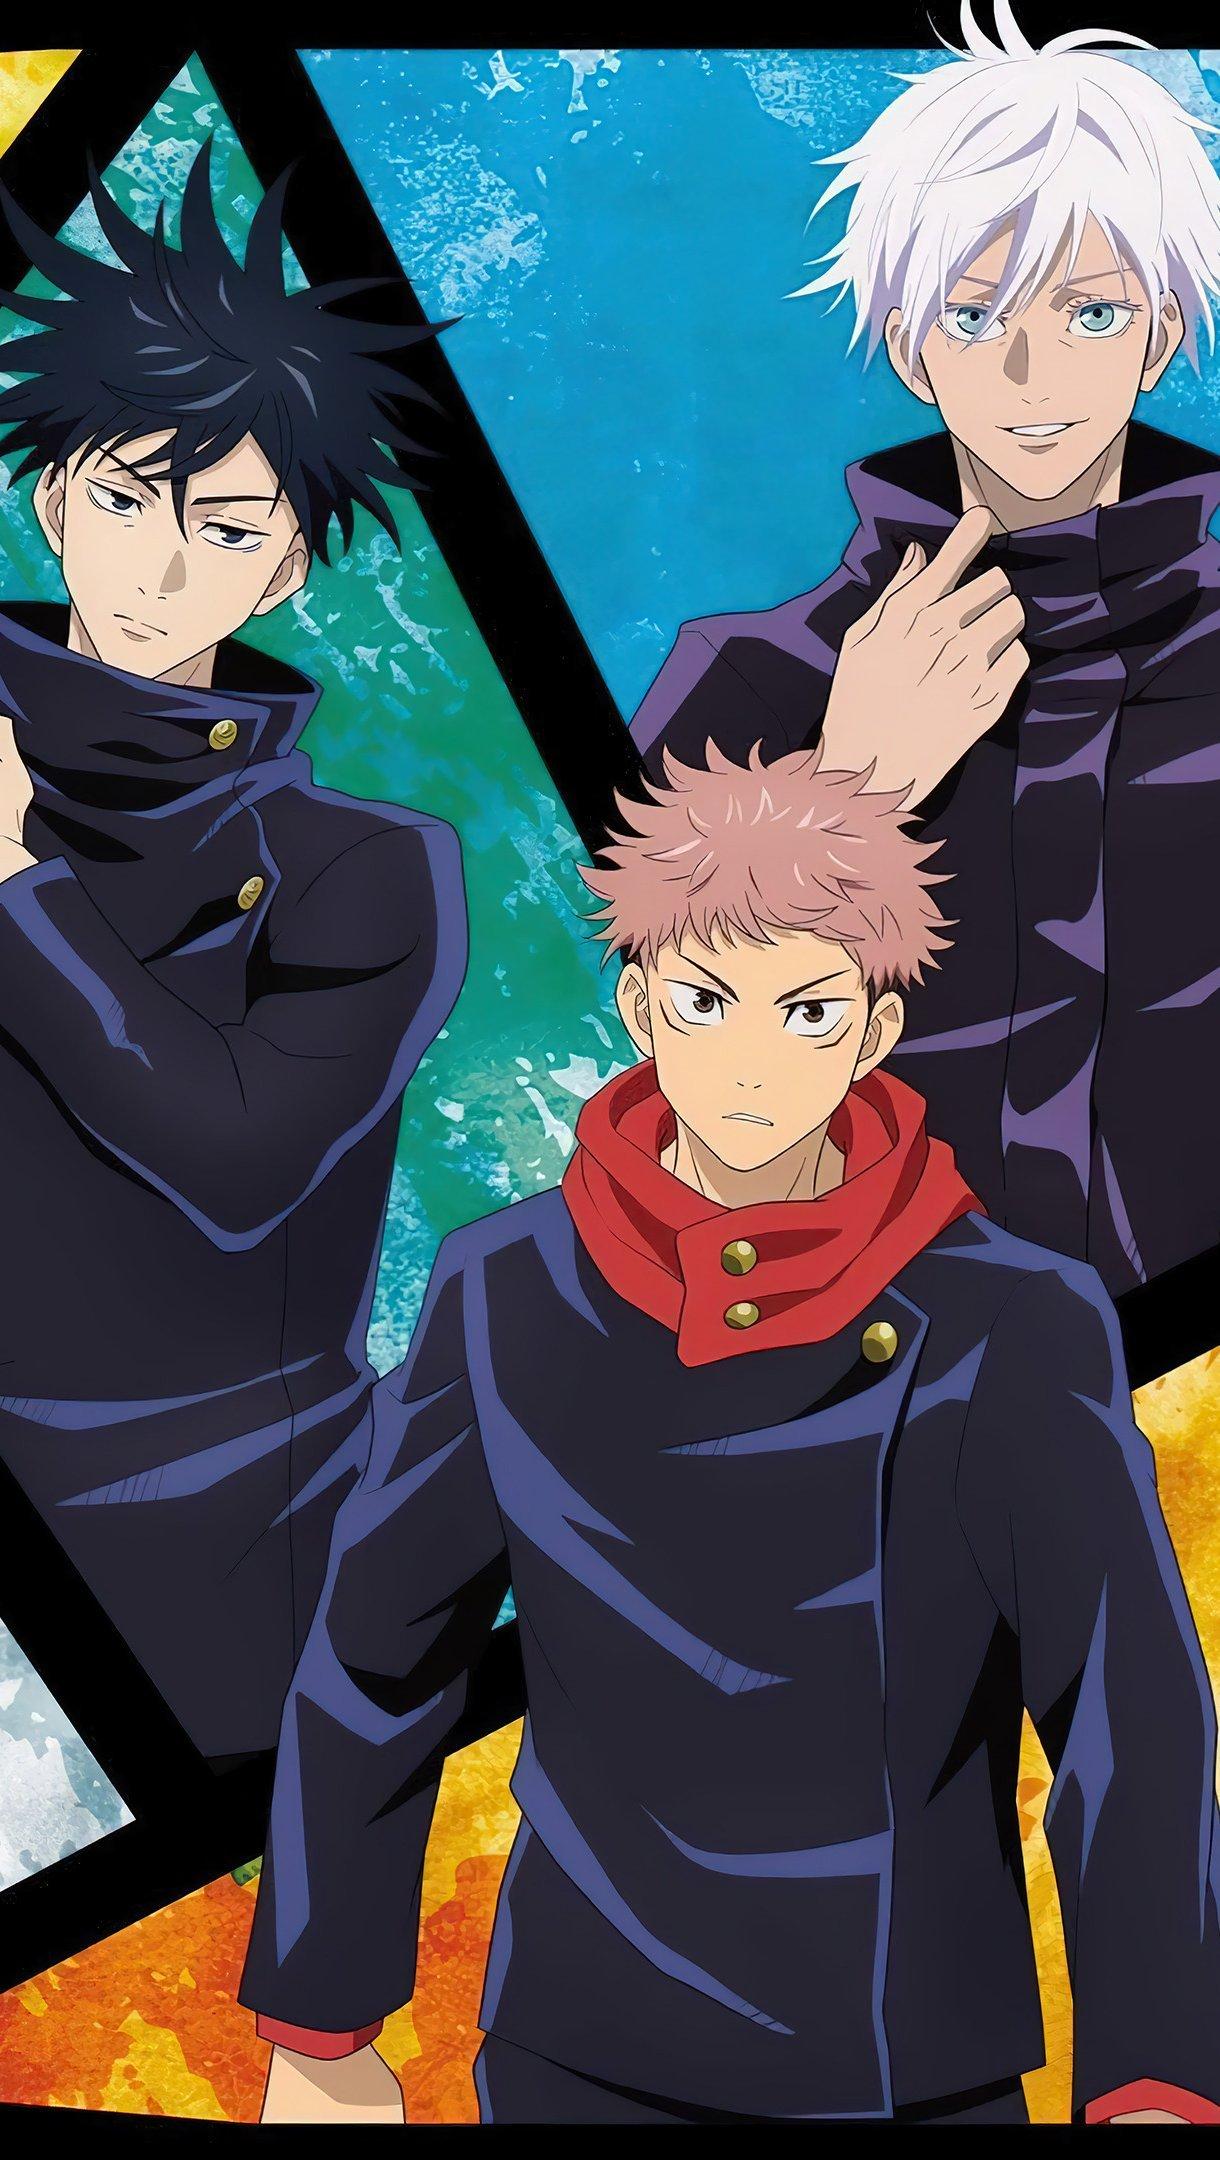 Fondos de pantalla Anime Personajes de Jujutsu Kaisen Vertical